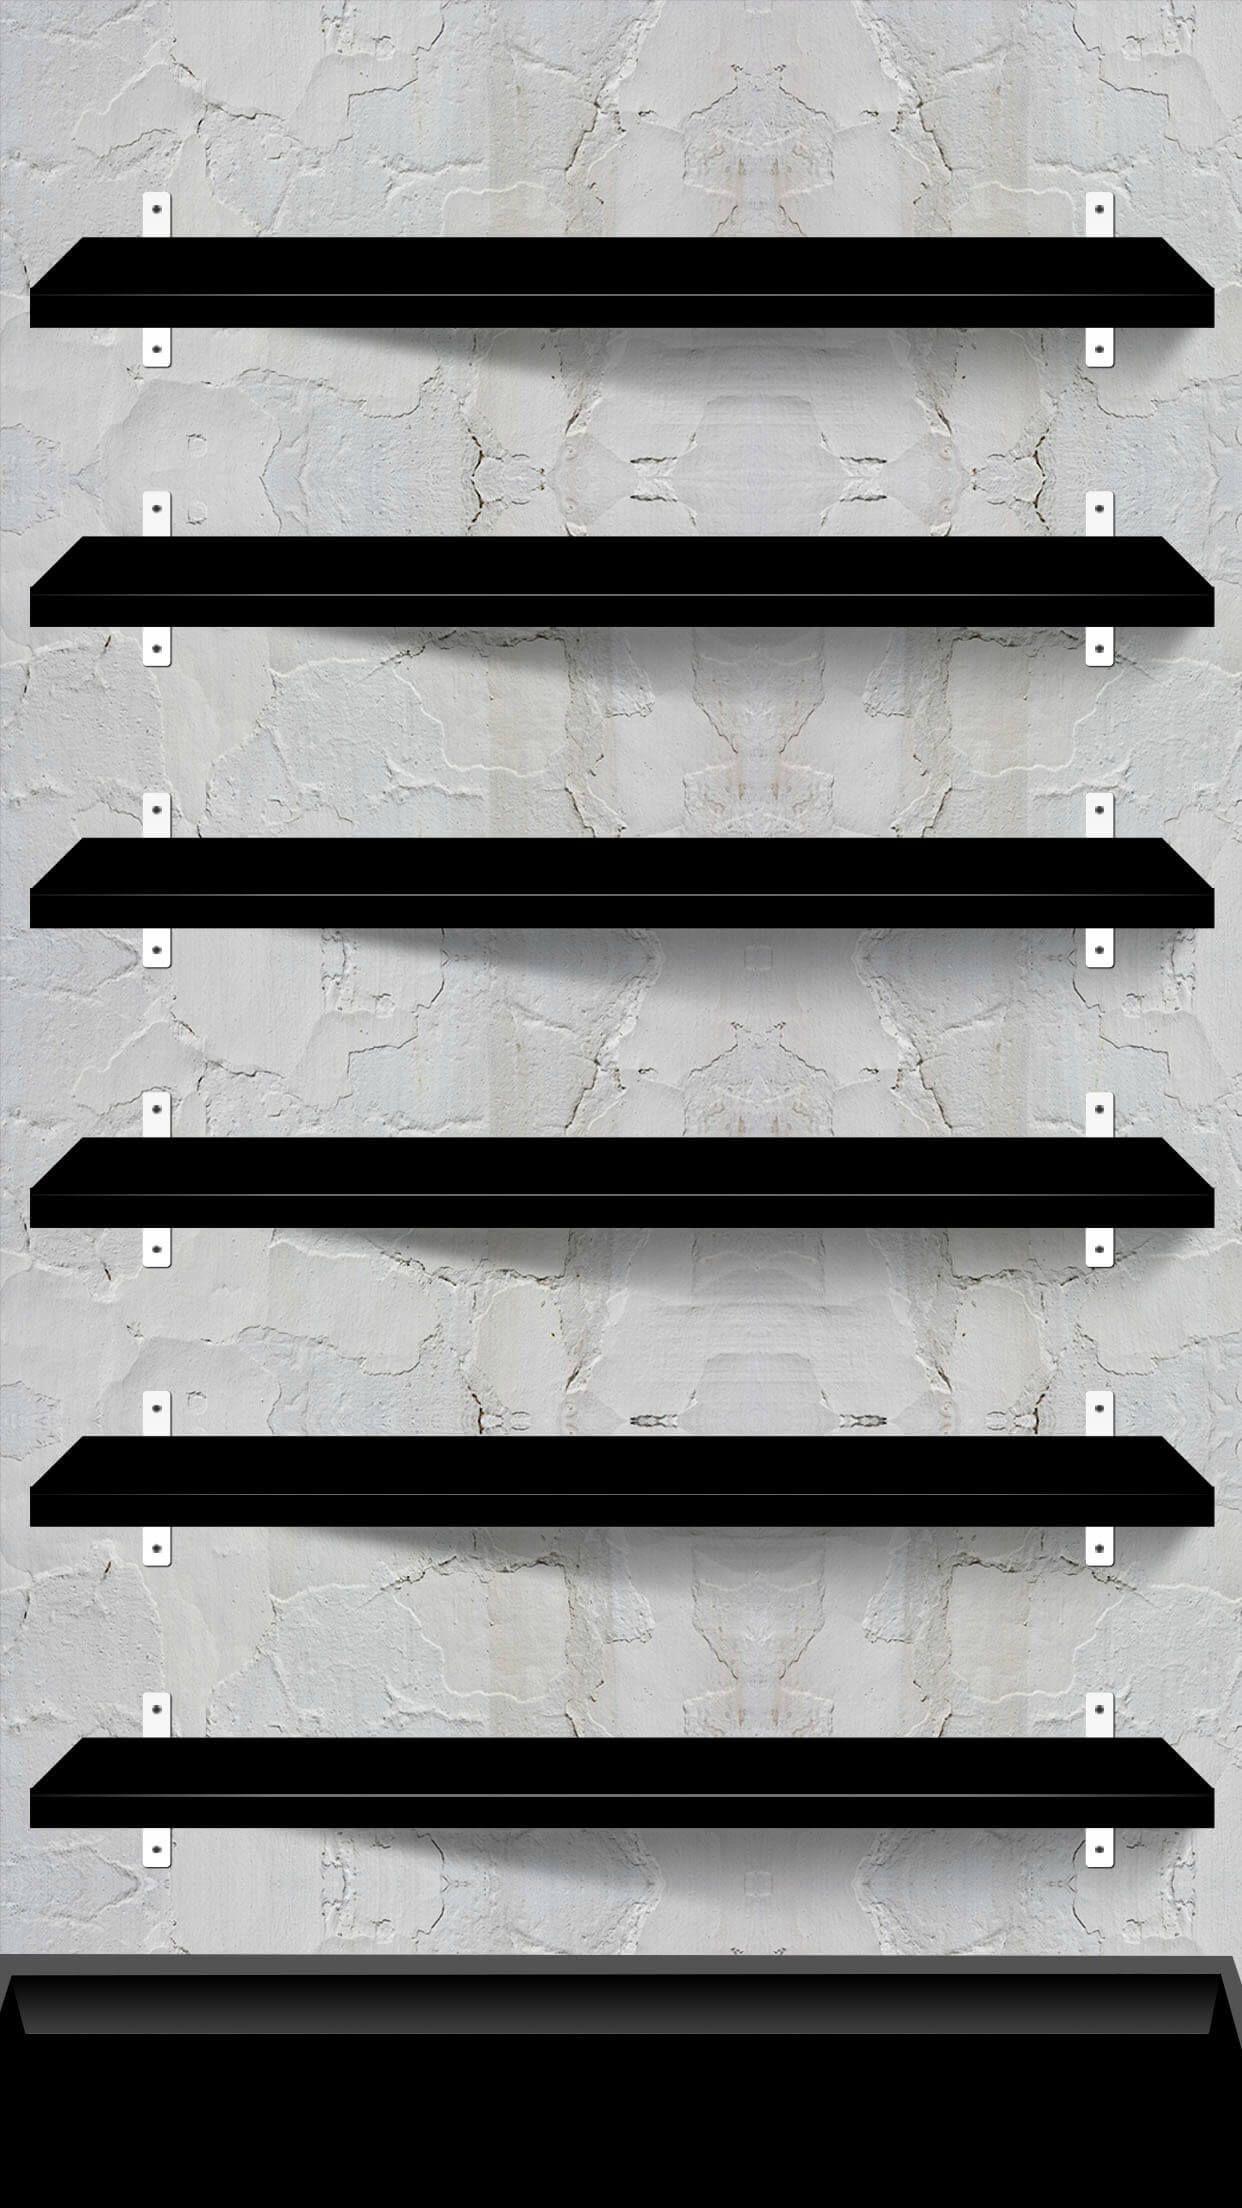 Wallpaper Etagere Iphone 7 Plus Icones Fond 3 Jpg Fond D Ecran Iphone 7 Plus Fond D Ecran Minimaliste Fond D Ecran Android